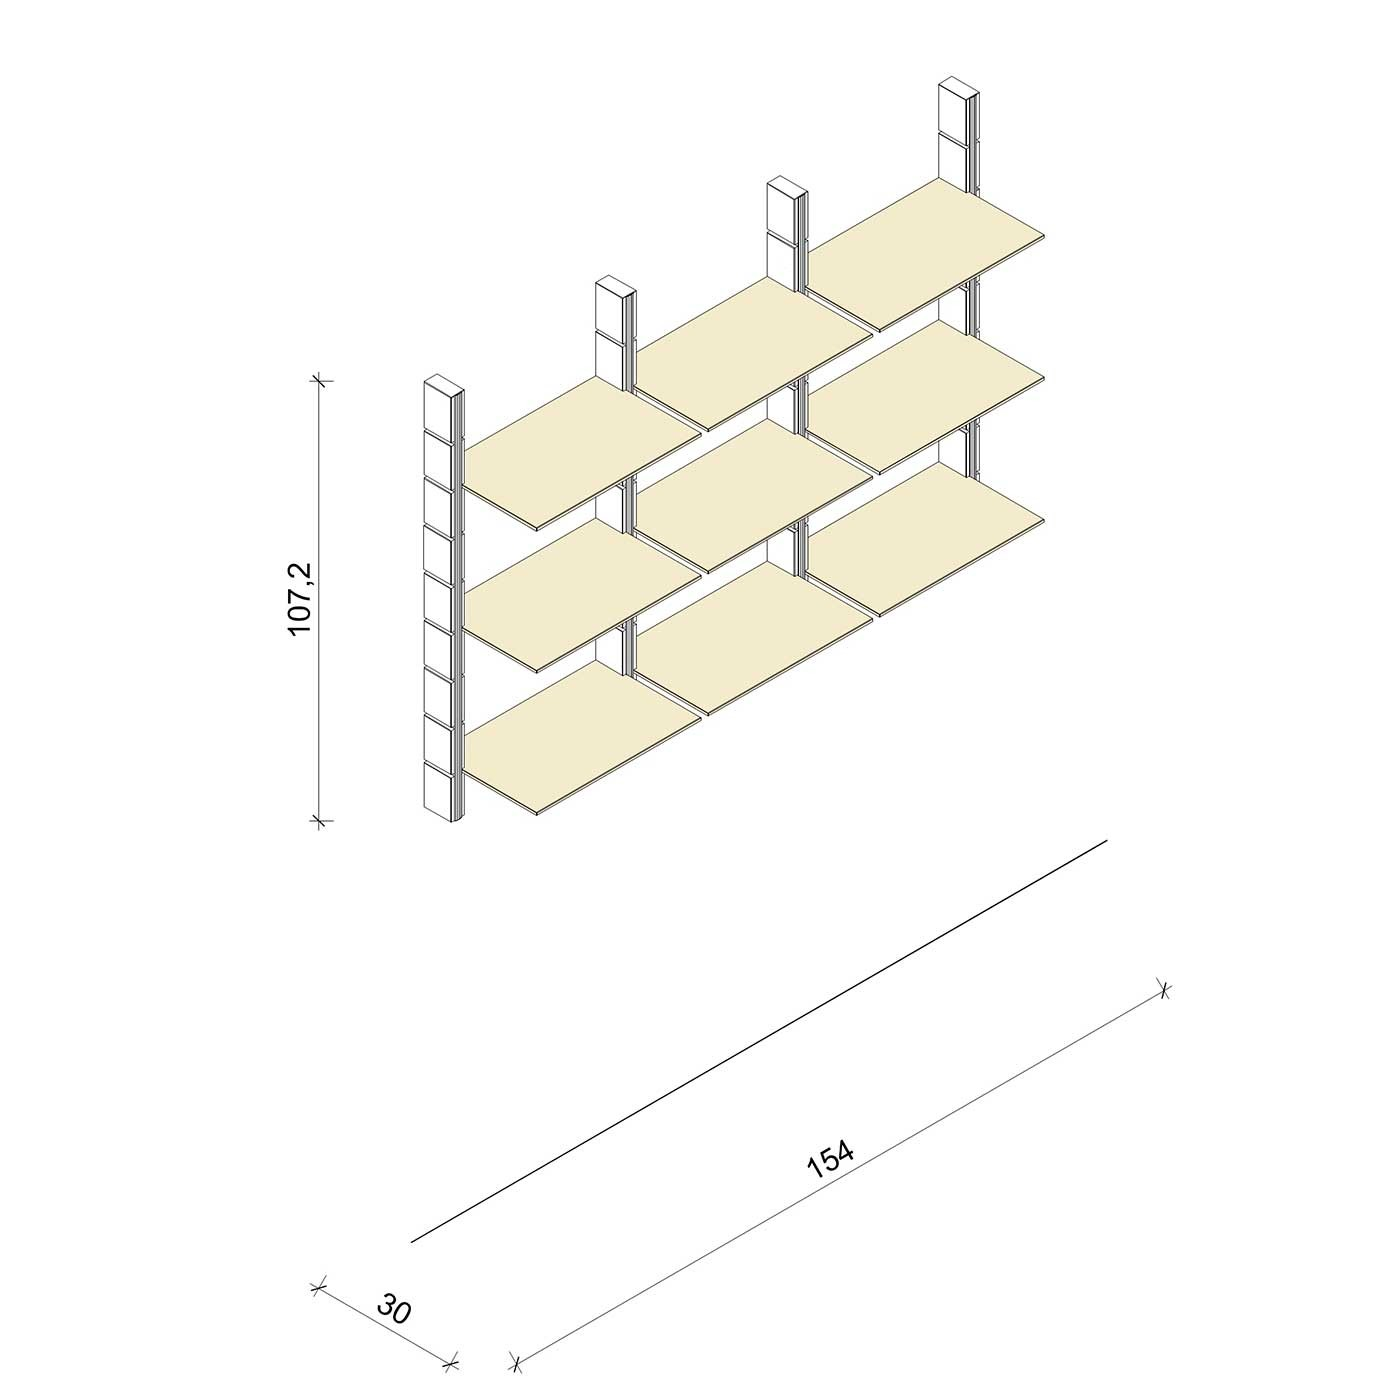 Bücherregal - Comfort (M) 154 - Maß: 154 x 107,2 x 30 cm (B x H x T)